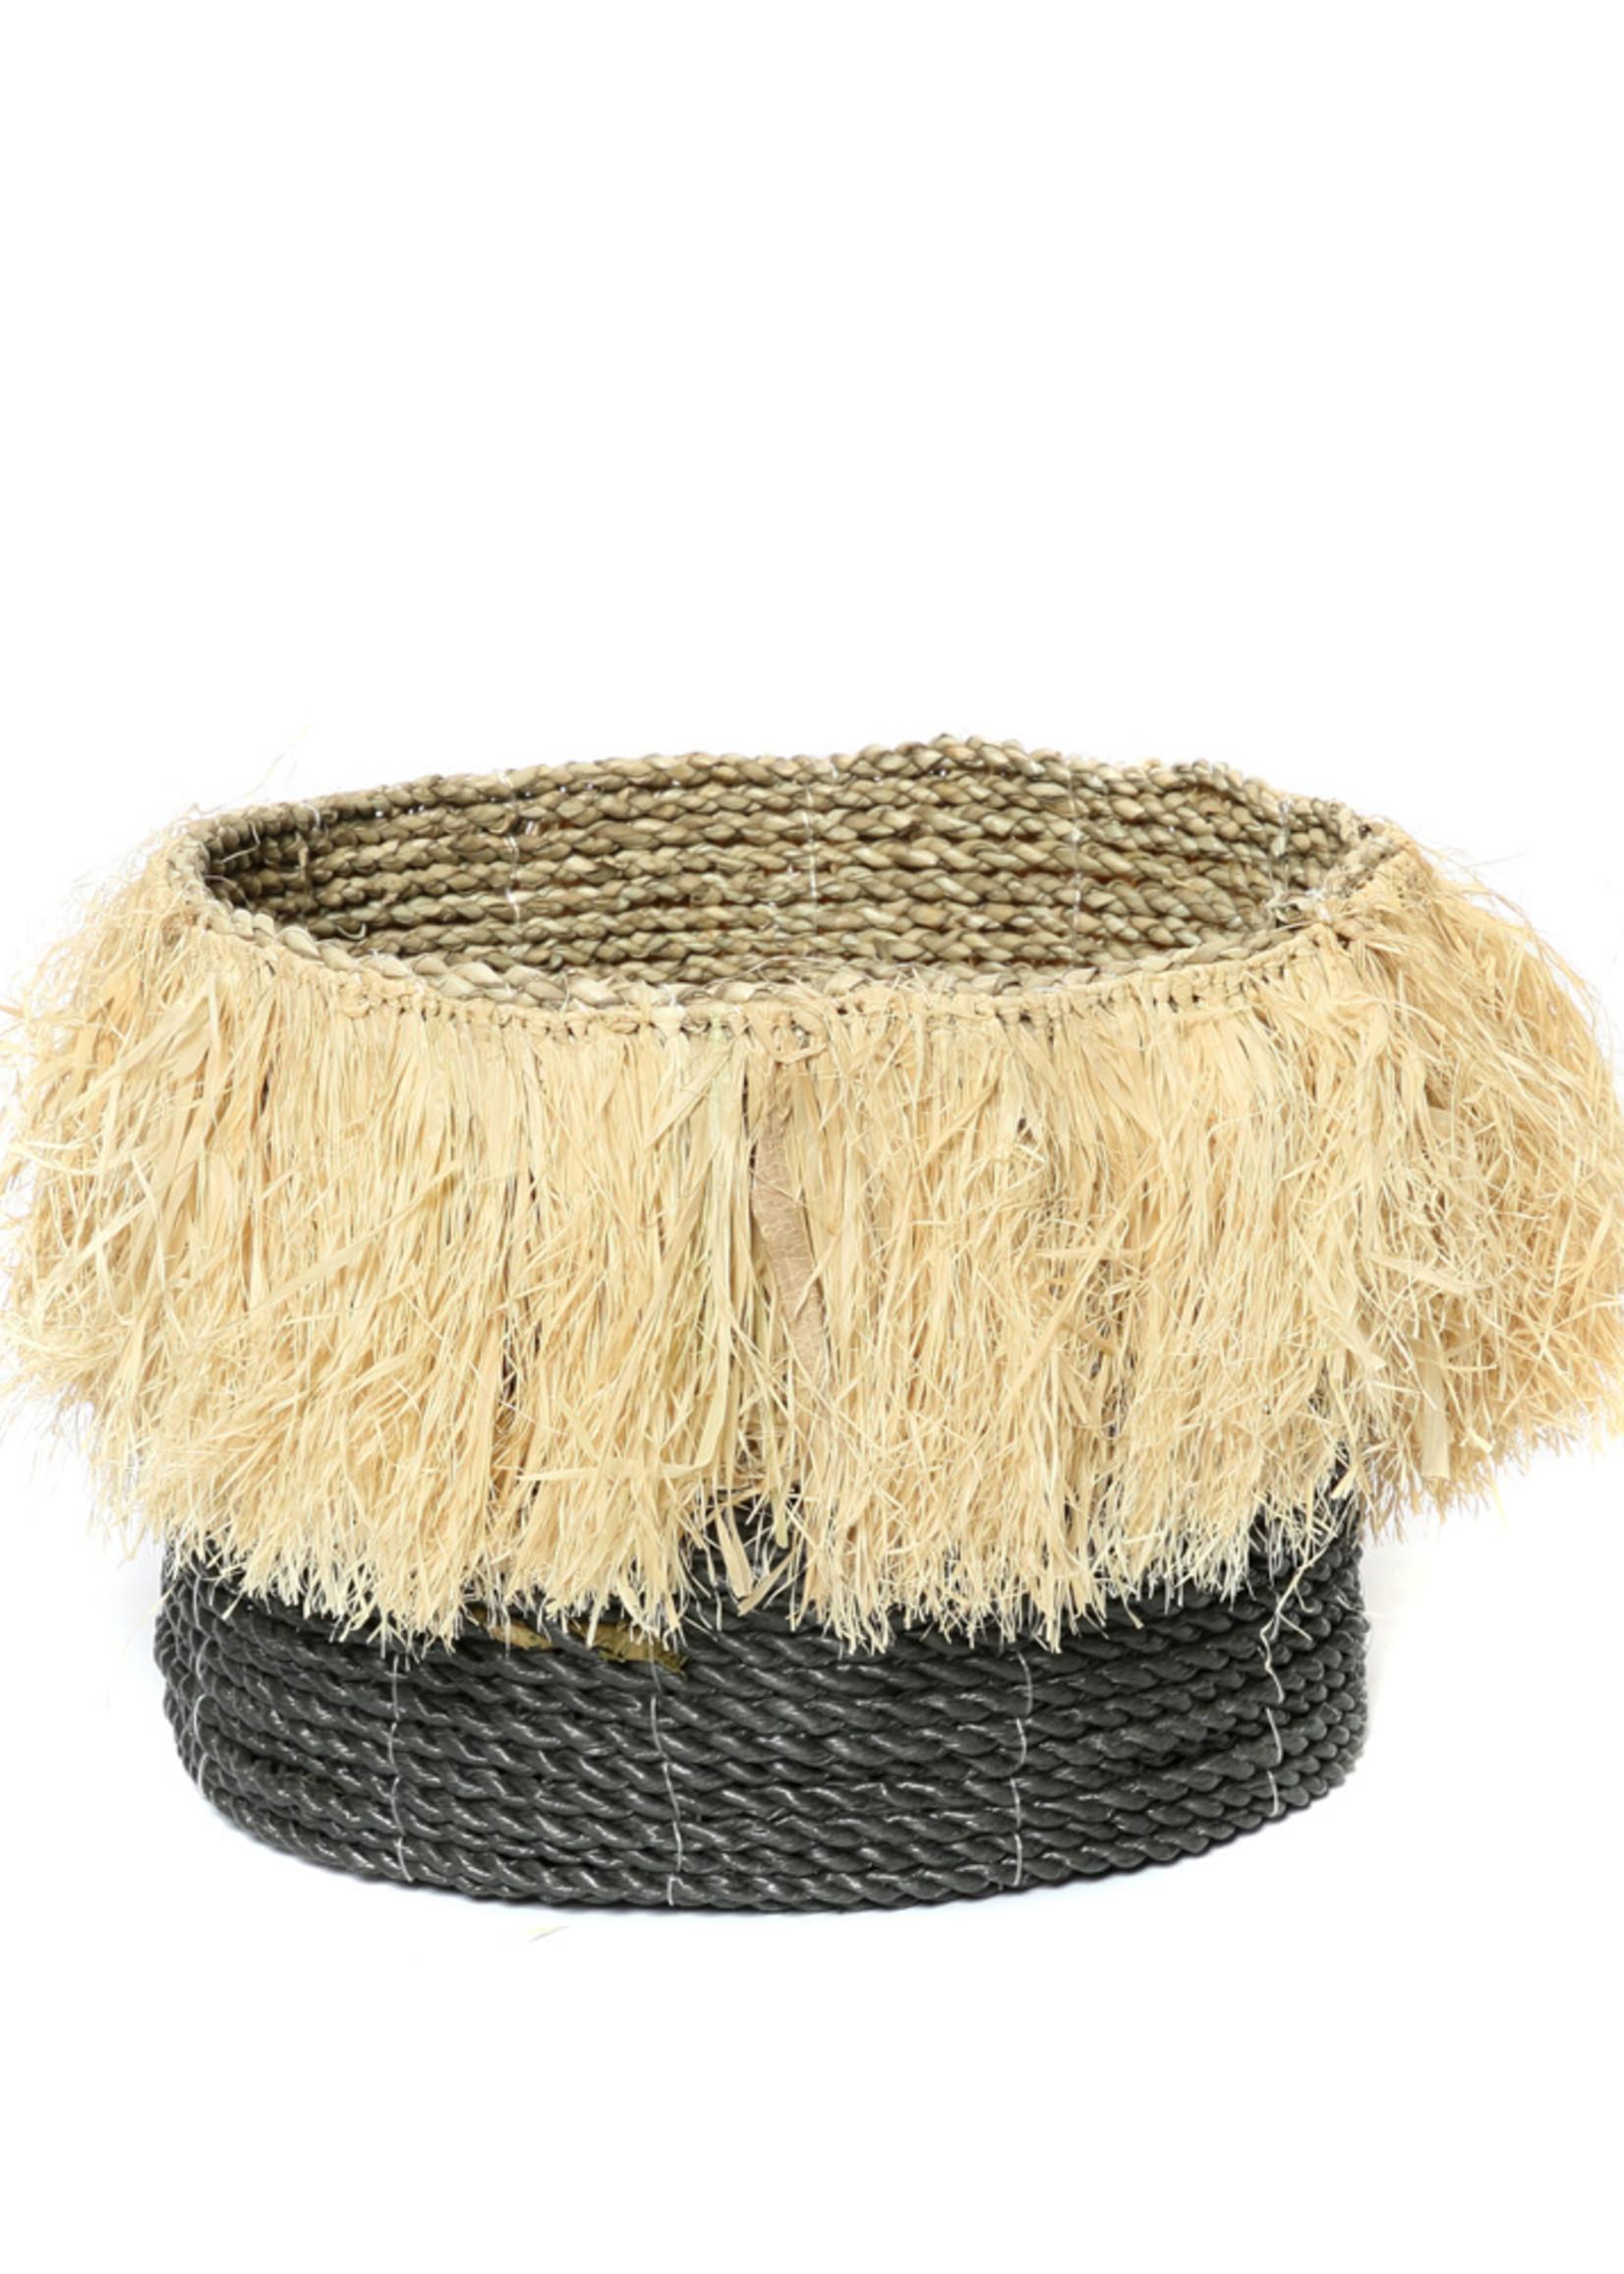 The Aloha Baskets - Black Natural - M